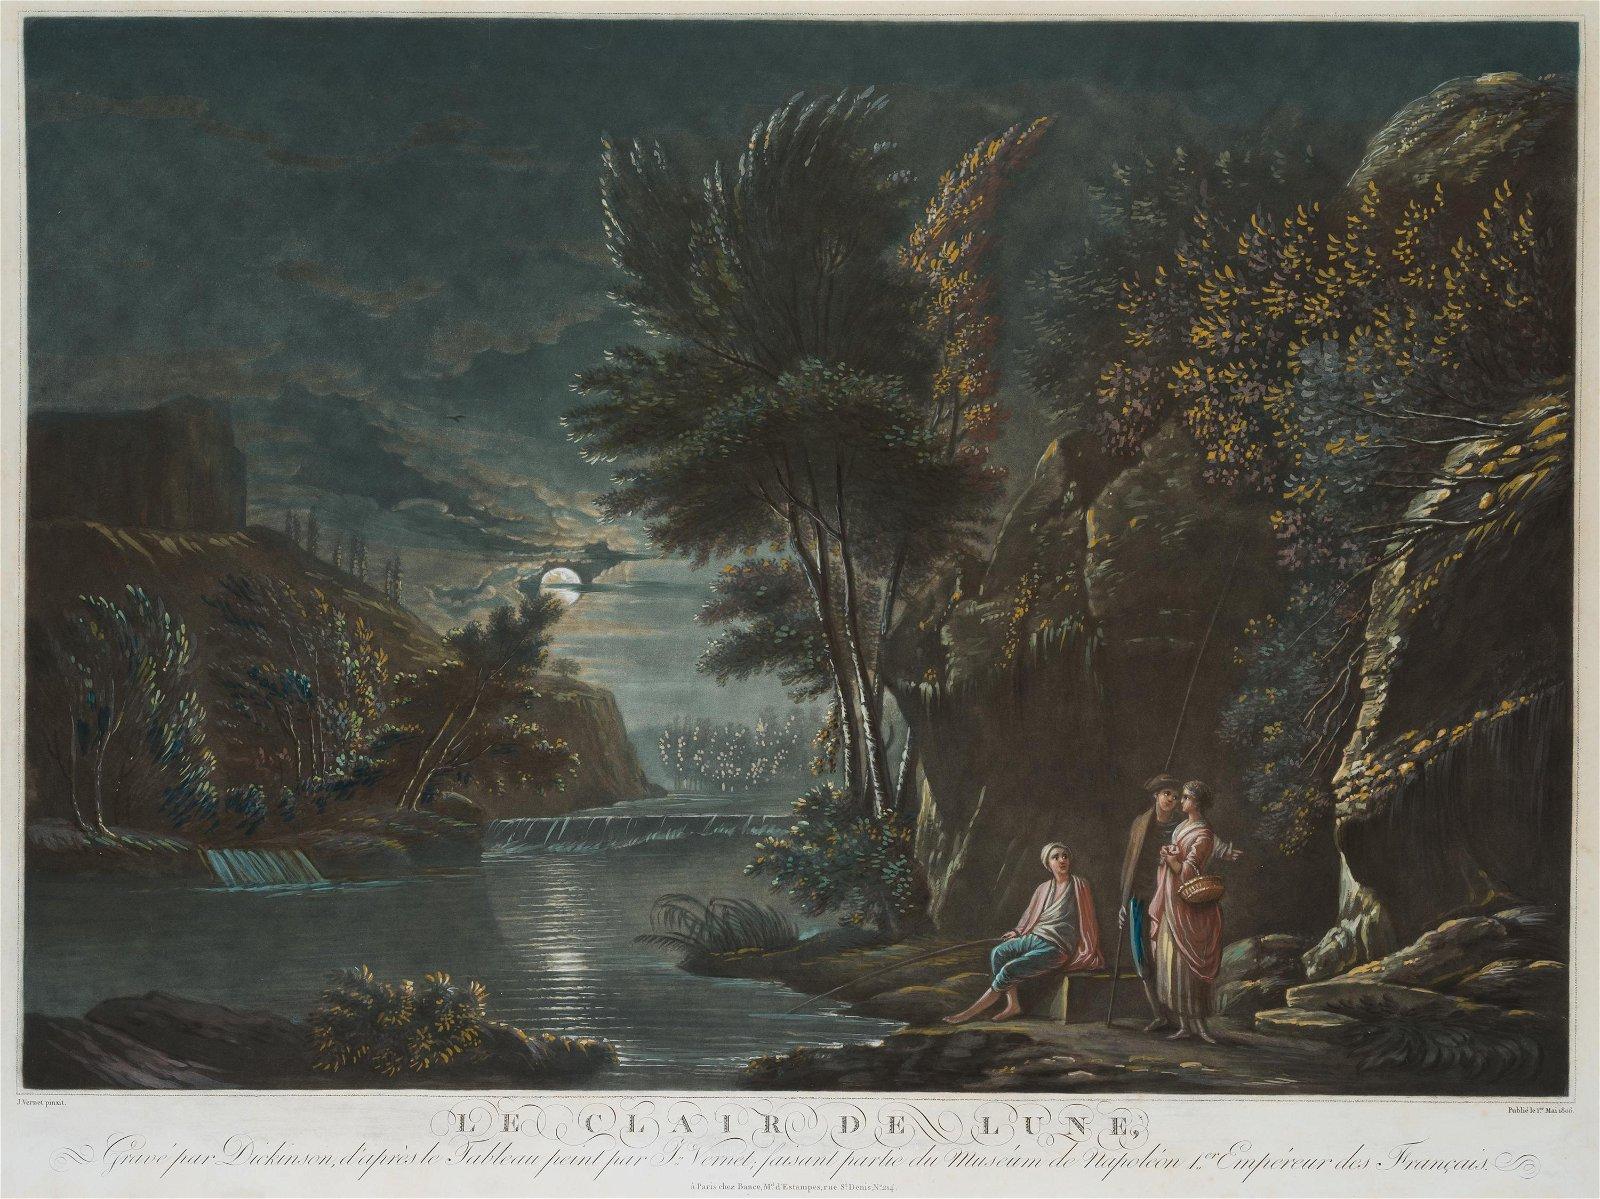 W.DICKINSON(*1746) after Claude Joseph Vernet: